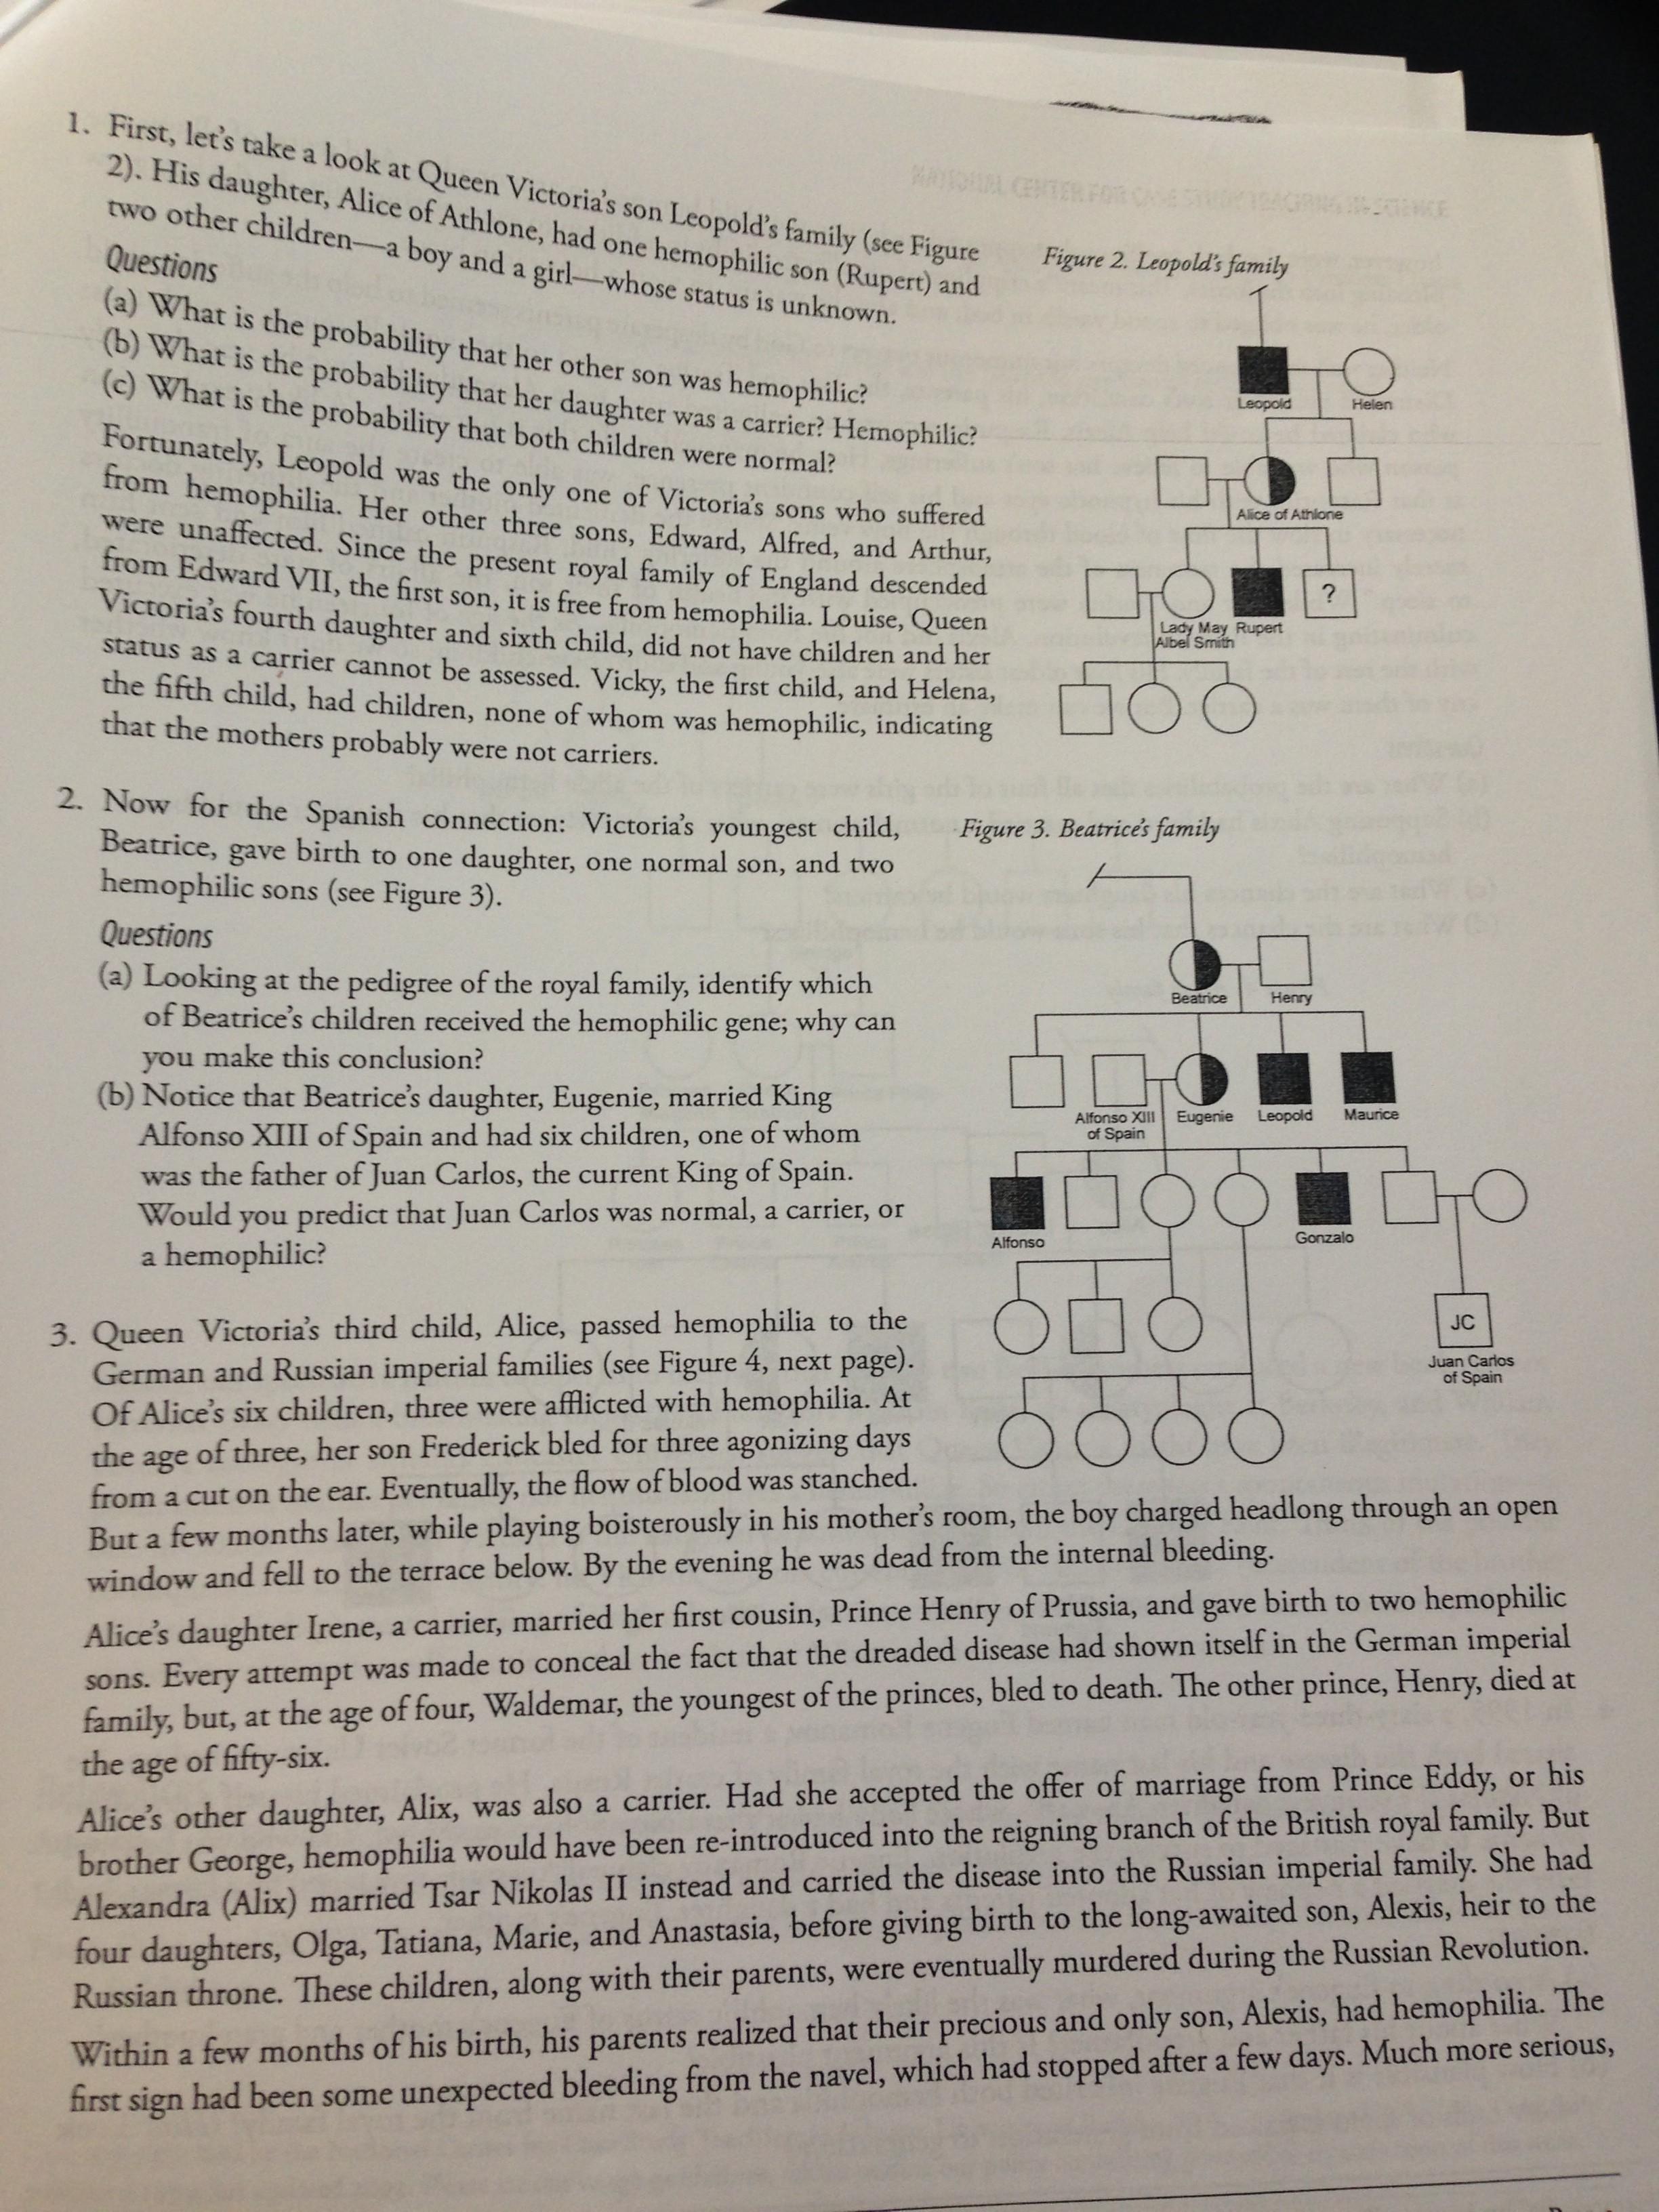 interpersonal communication case study analysis